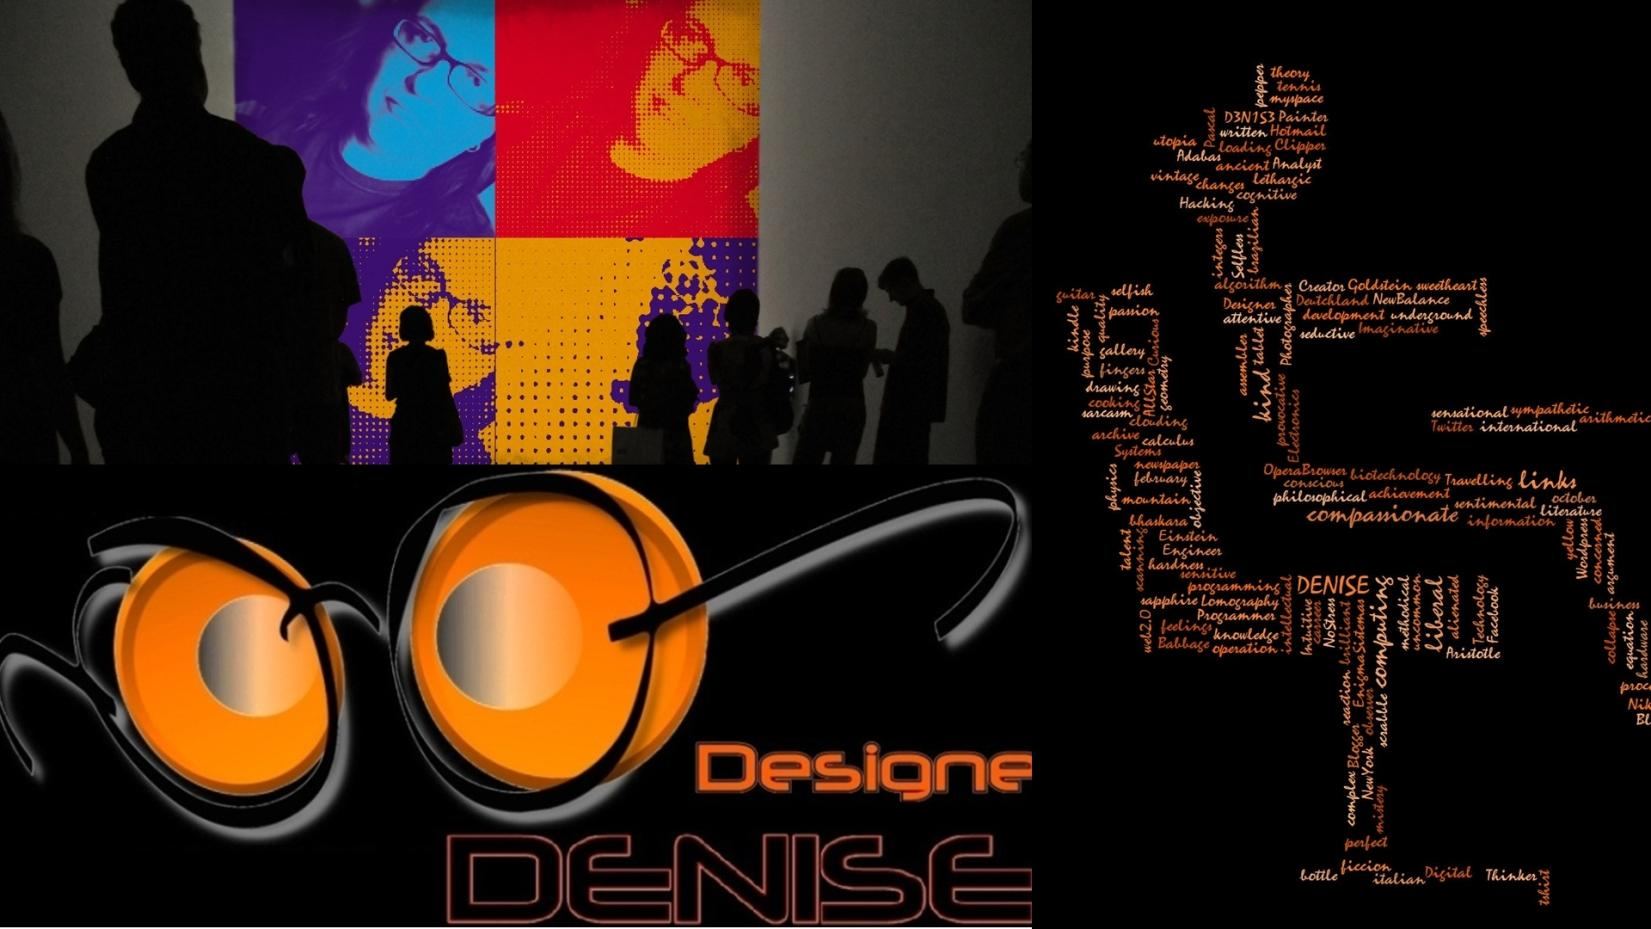 DeniseAS